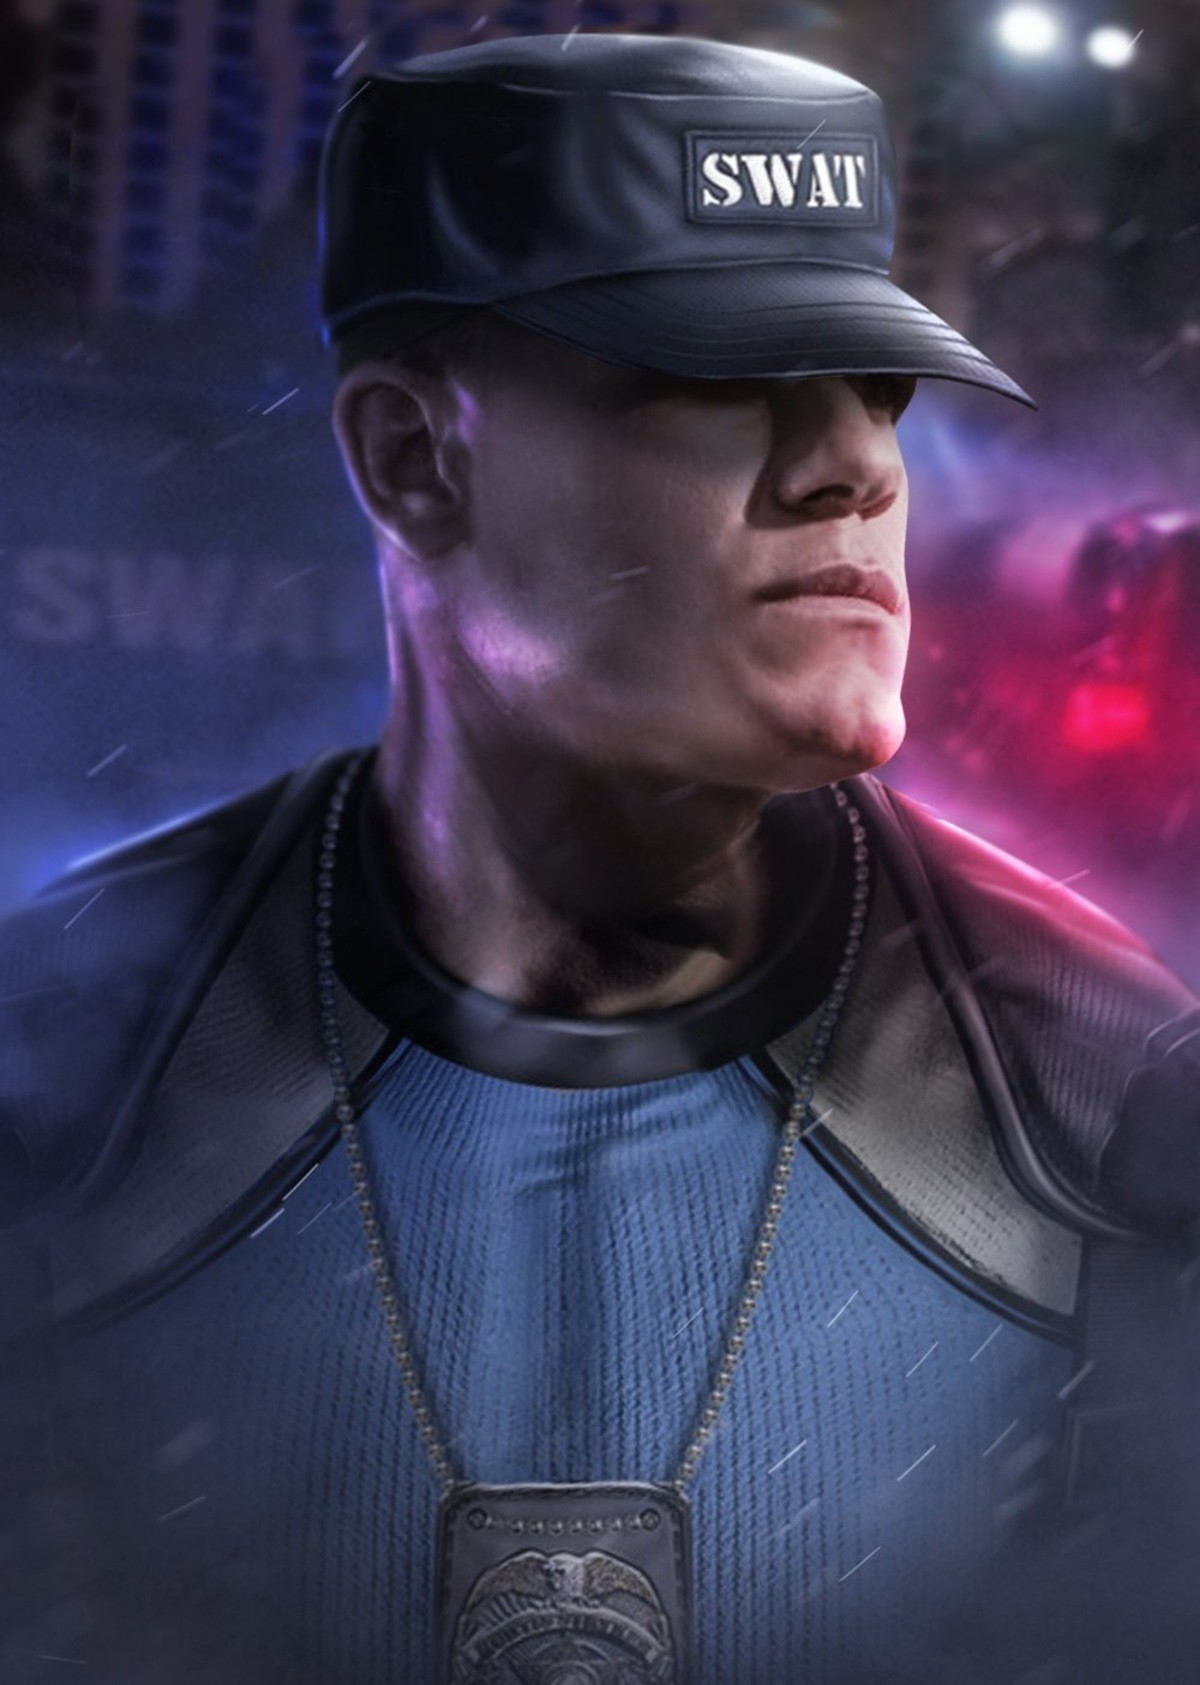 John Cena as Stryker. .. BOOOOO